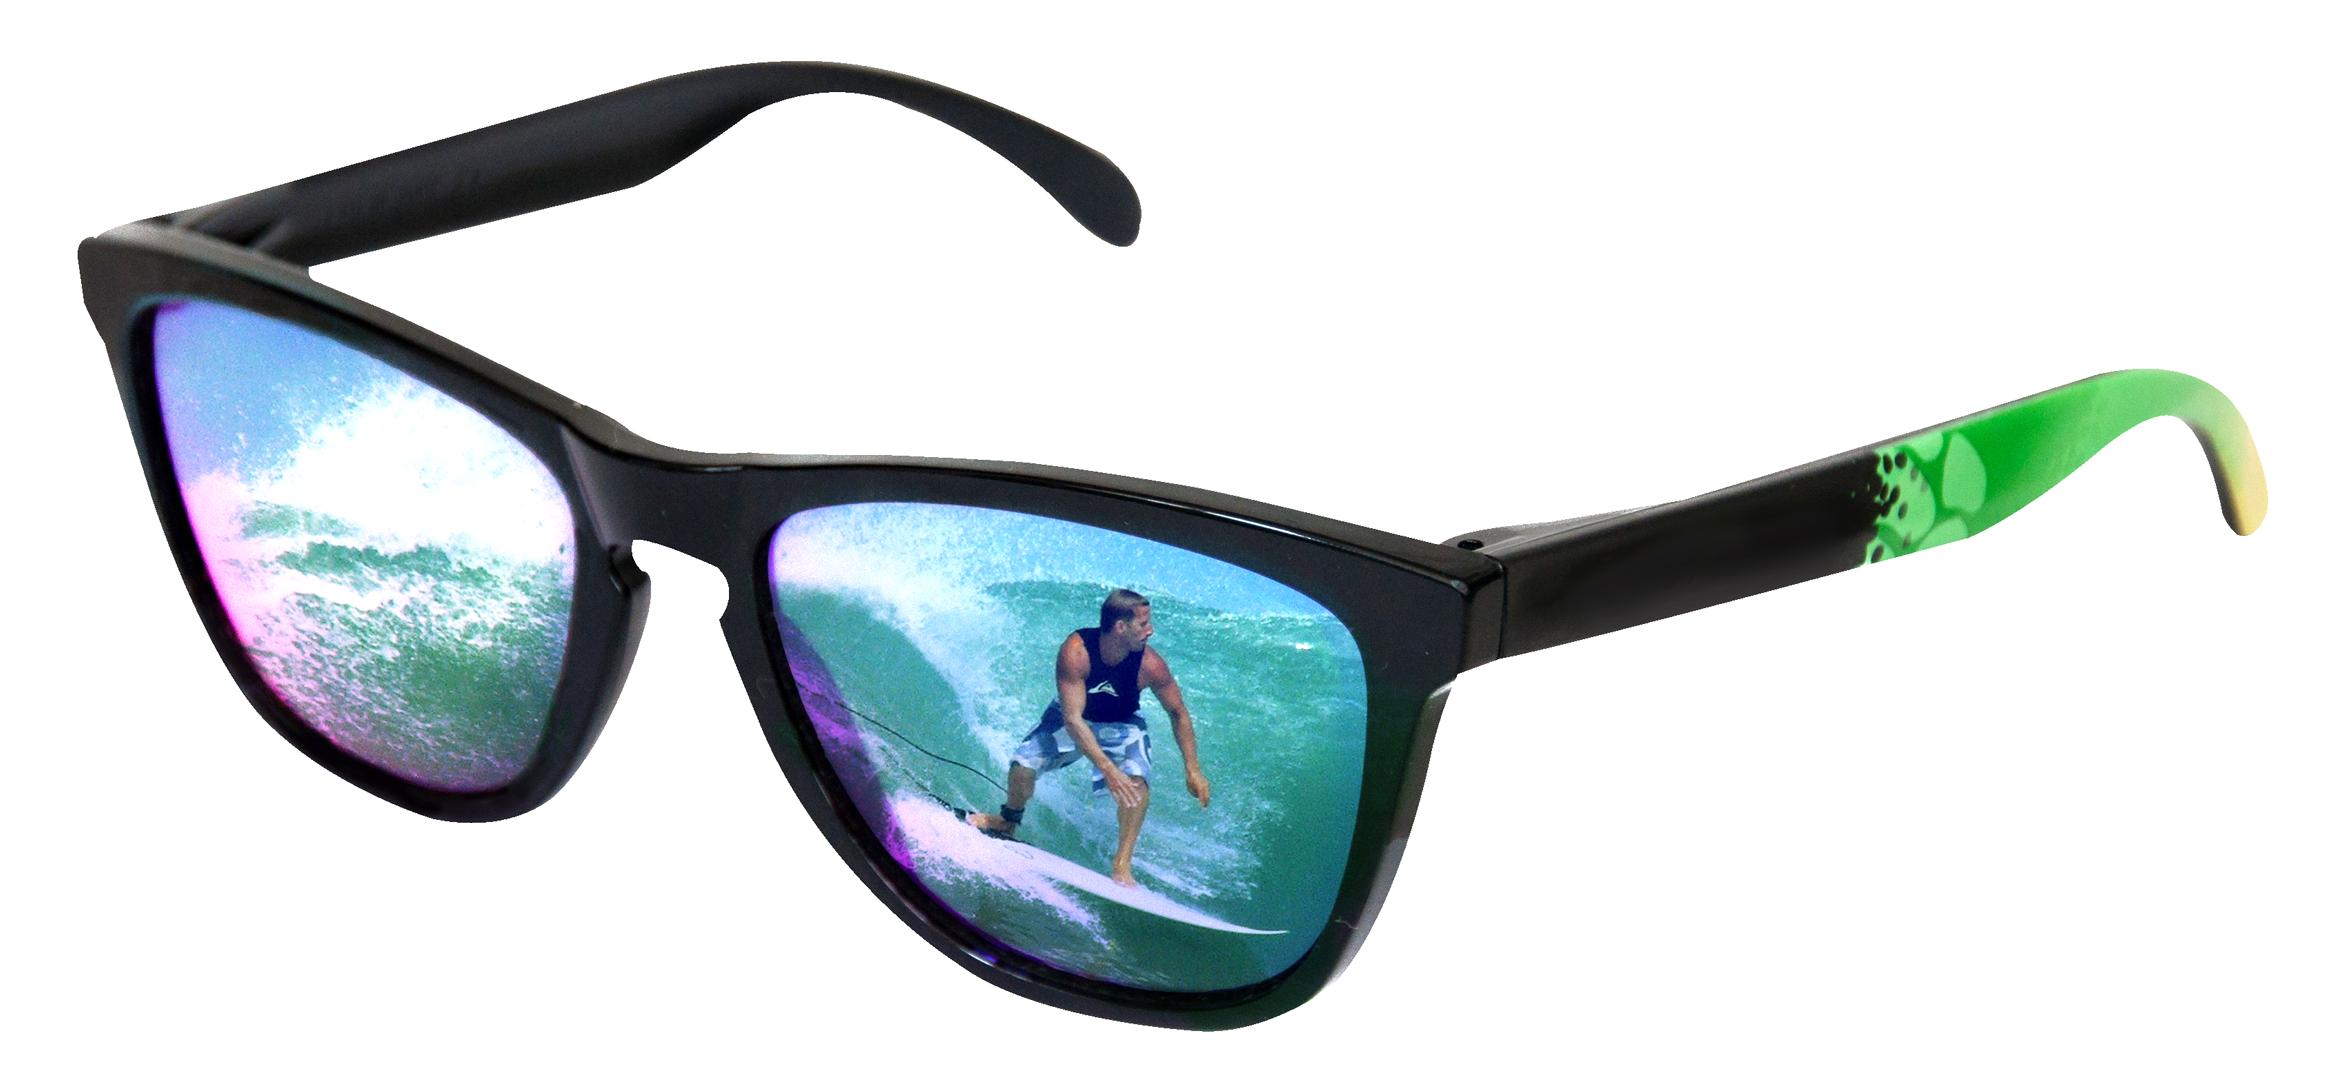 Sunglass png transparent images. Sunglasses clipart stylish